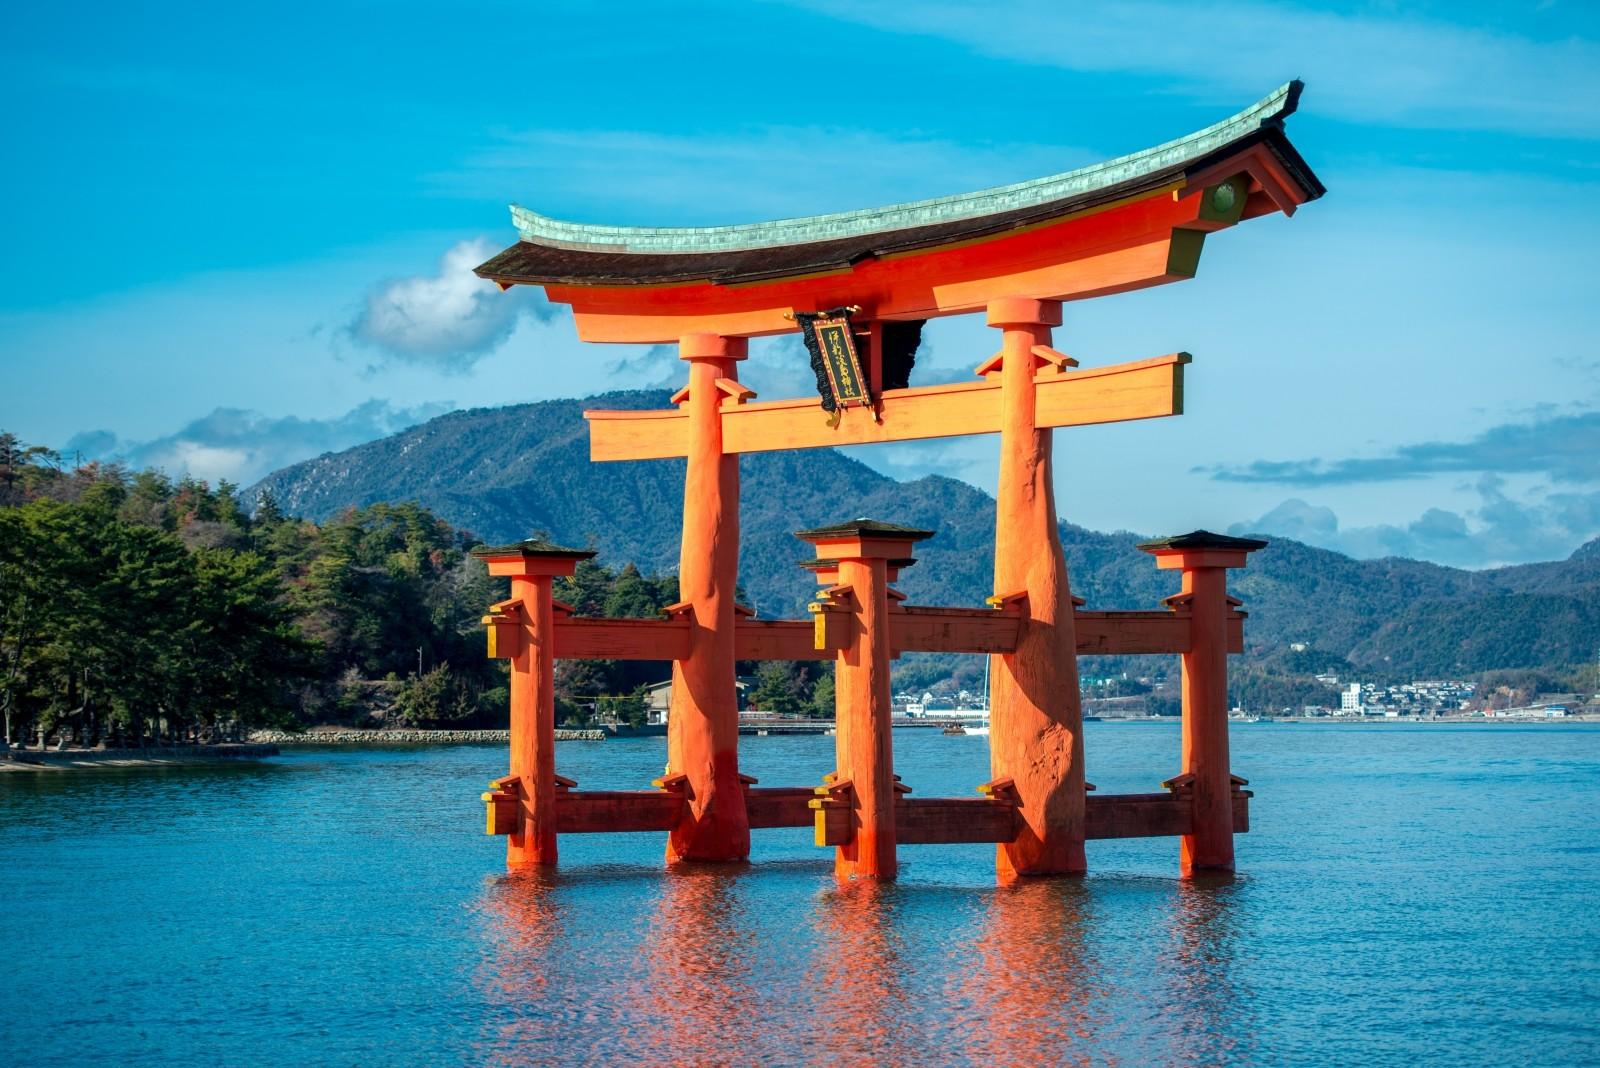 hiroshima-japan-japanese-landmark-architecture